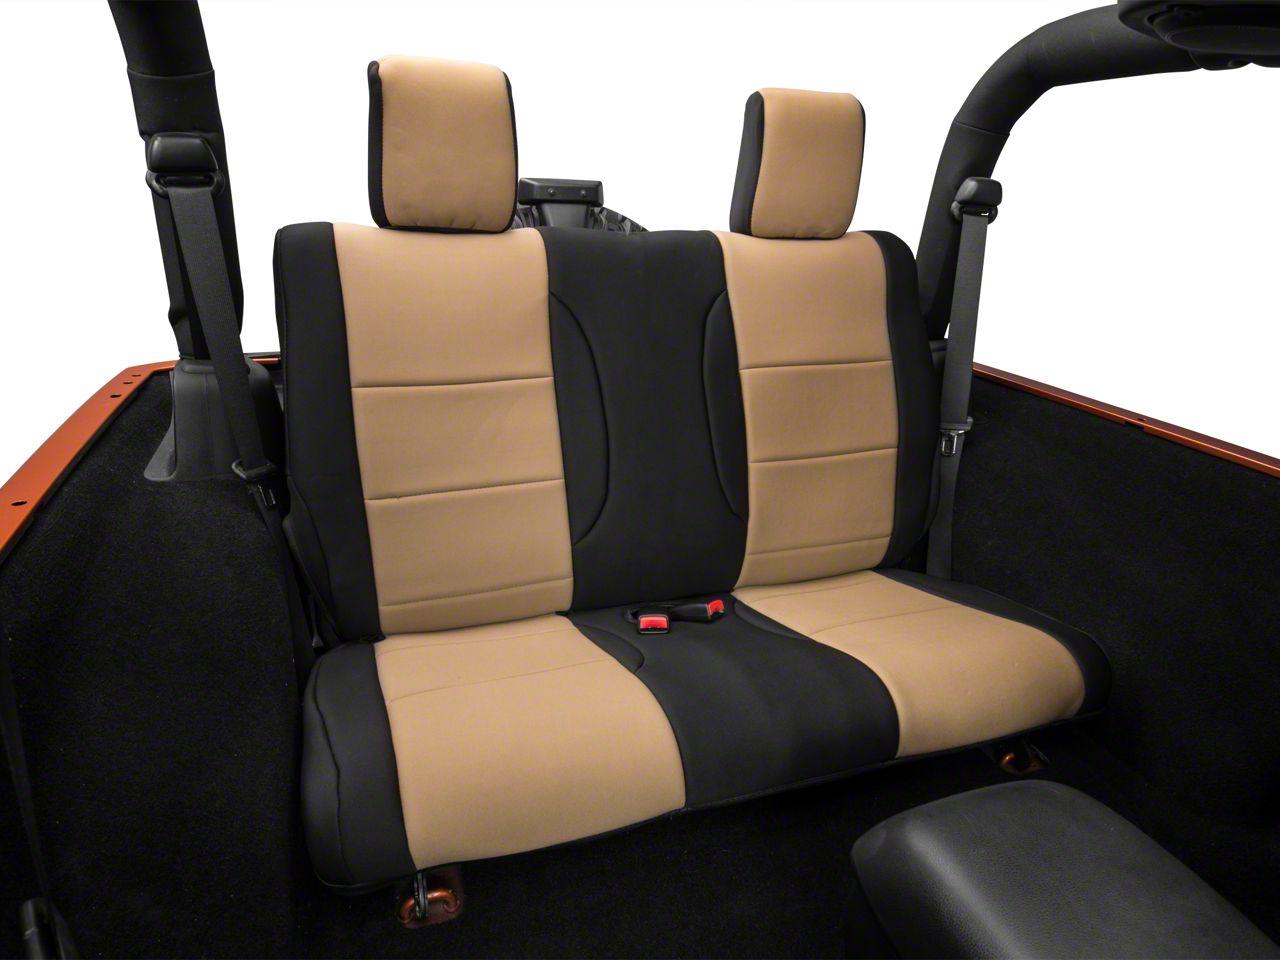 Rugged Ridge Neoprene Rear Seat Cover - Black/Tan (07-18 Jeep Wrangler JK 2 Door)